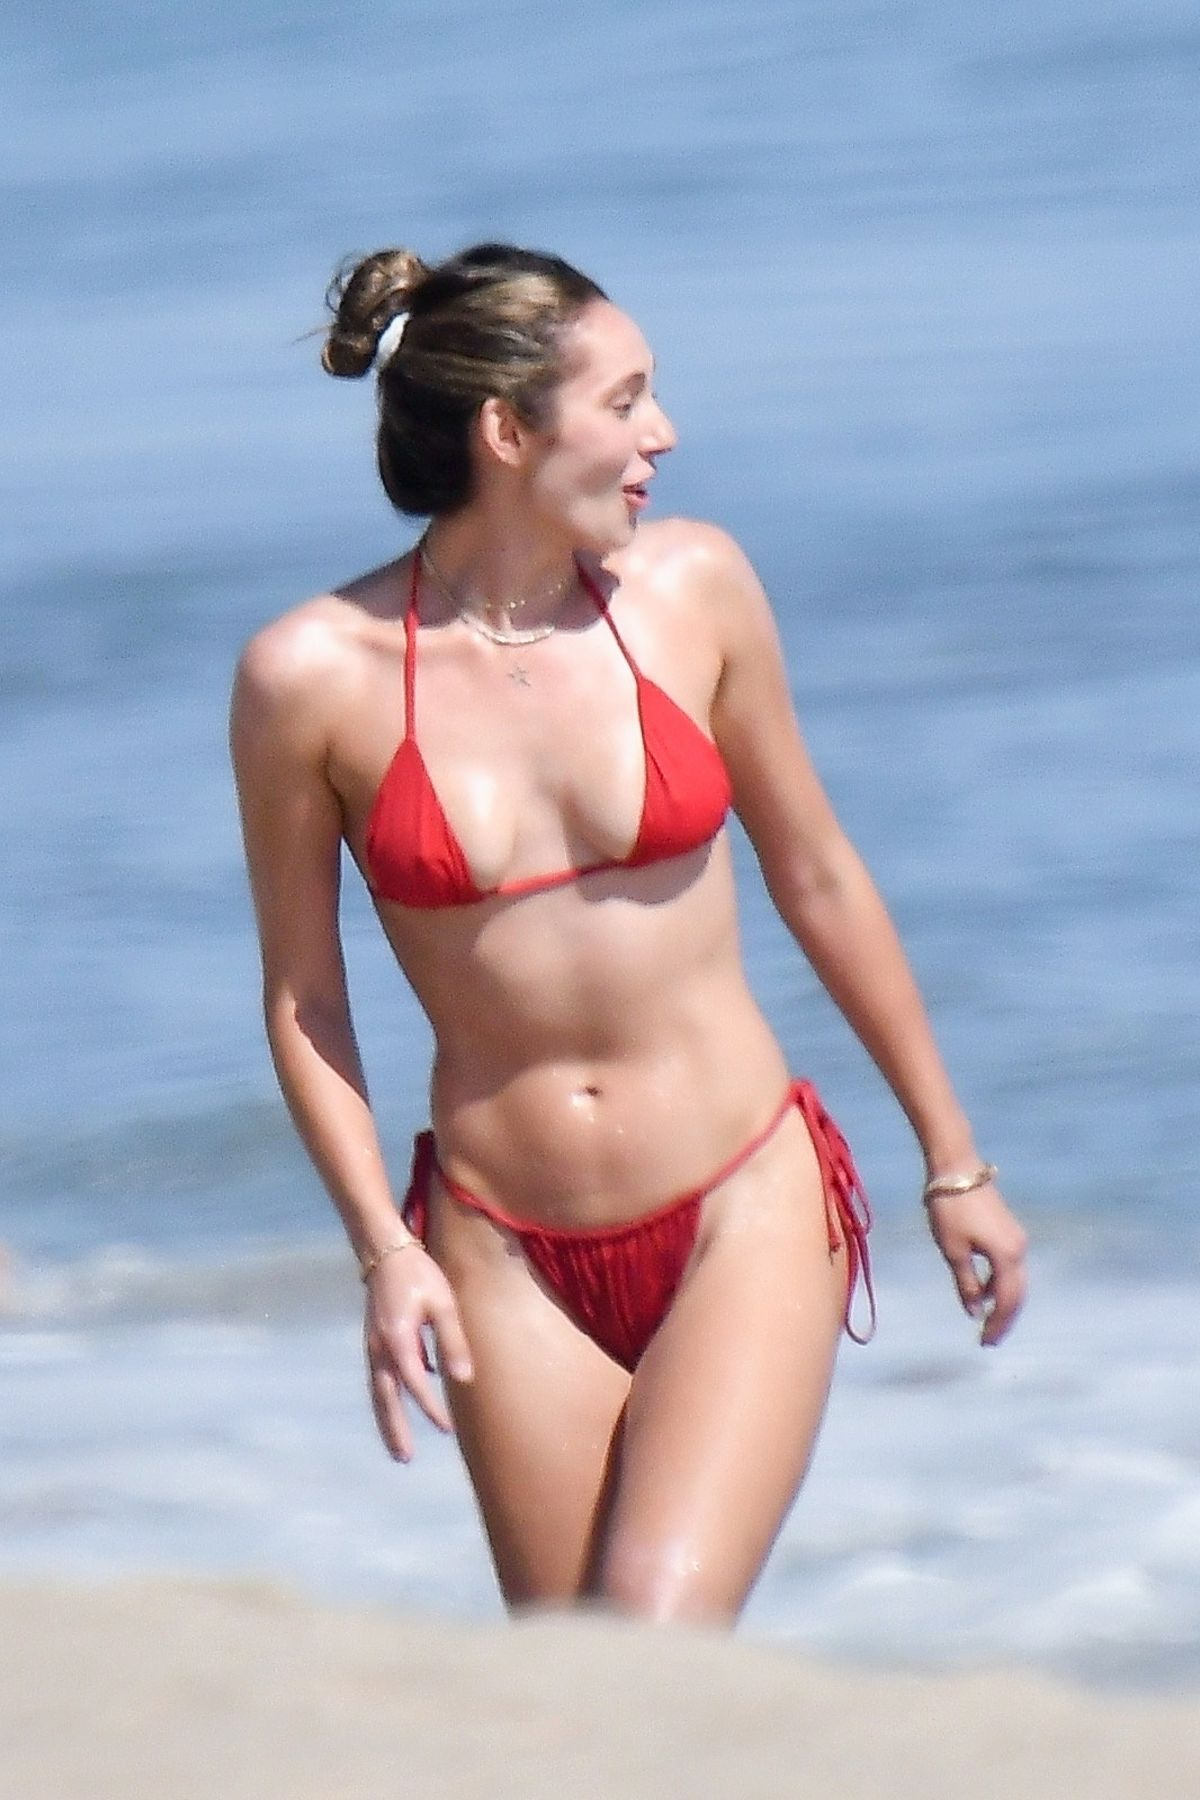 Jennifer Flanvin Sistine Sophia Scarlet Stallone Out Beach Malibu